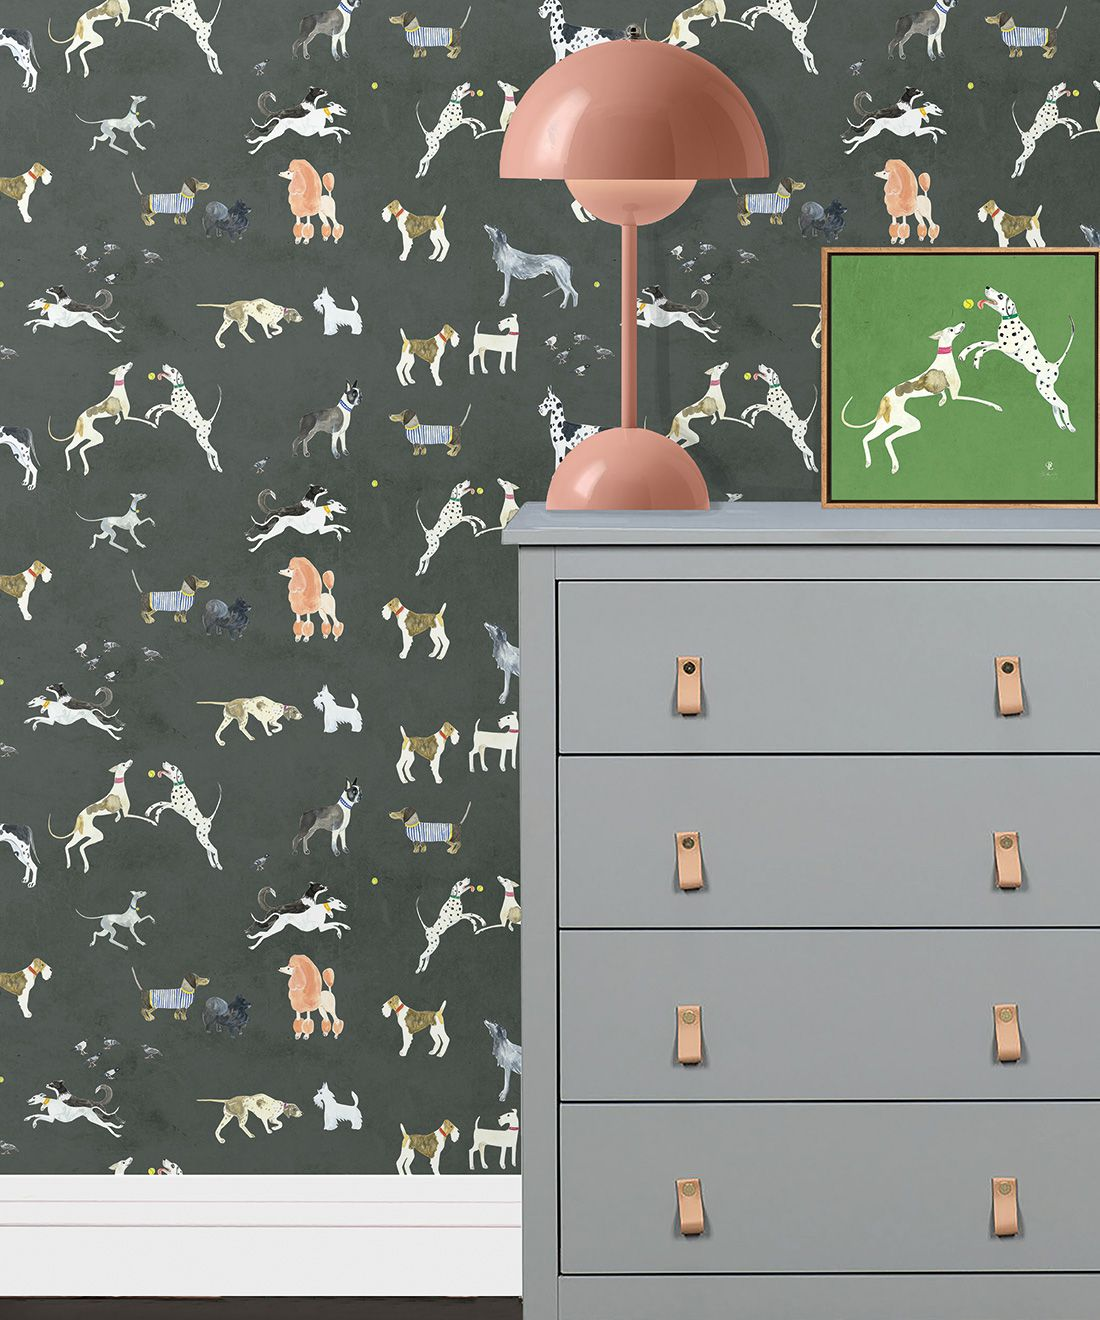 Doggies Wallpaper •Dog Wallpaper •Charcoal • Insitu with grey dresser and salmon lamp